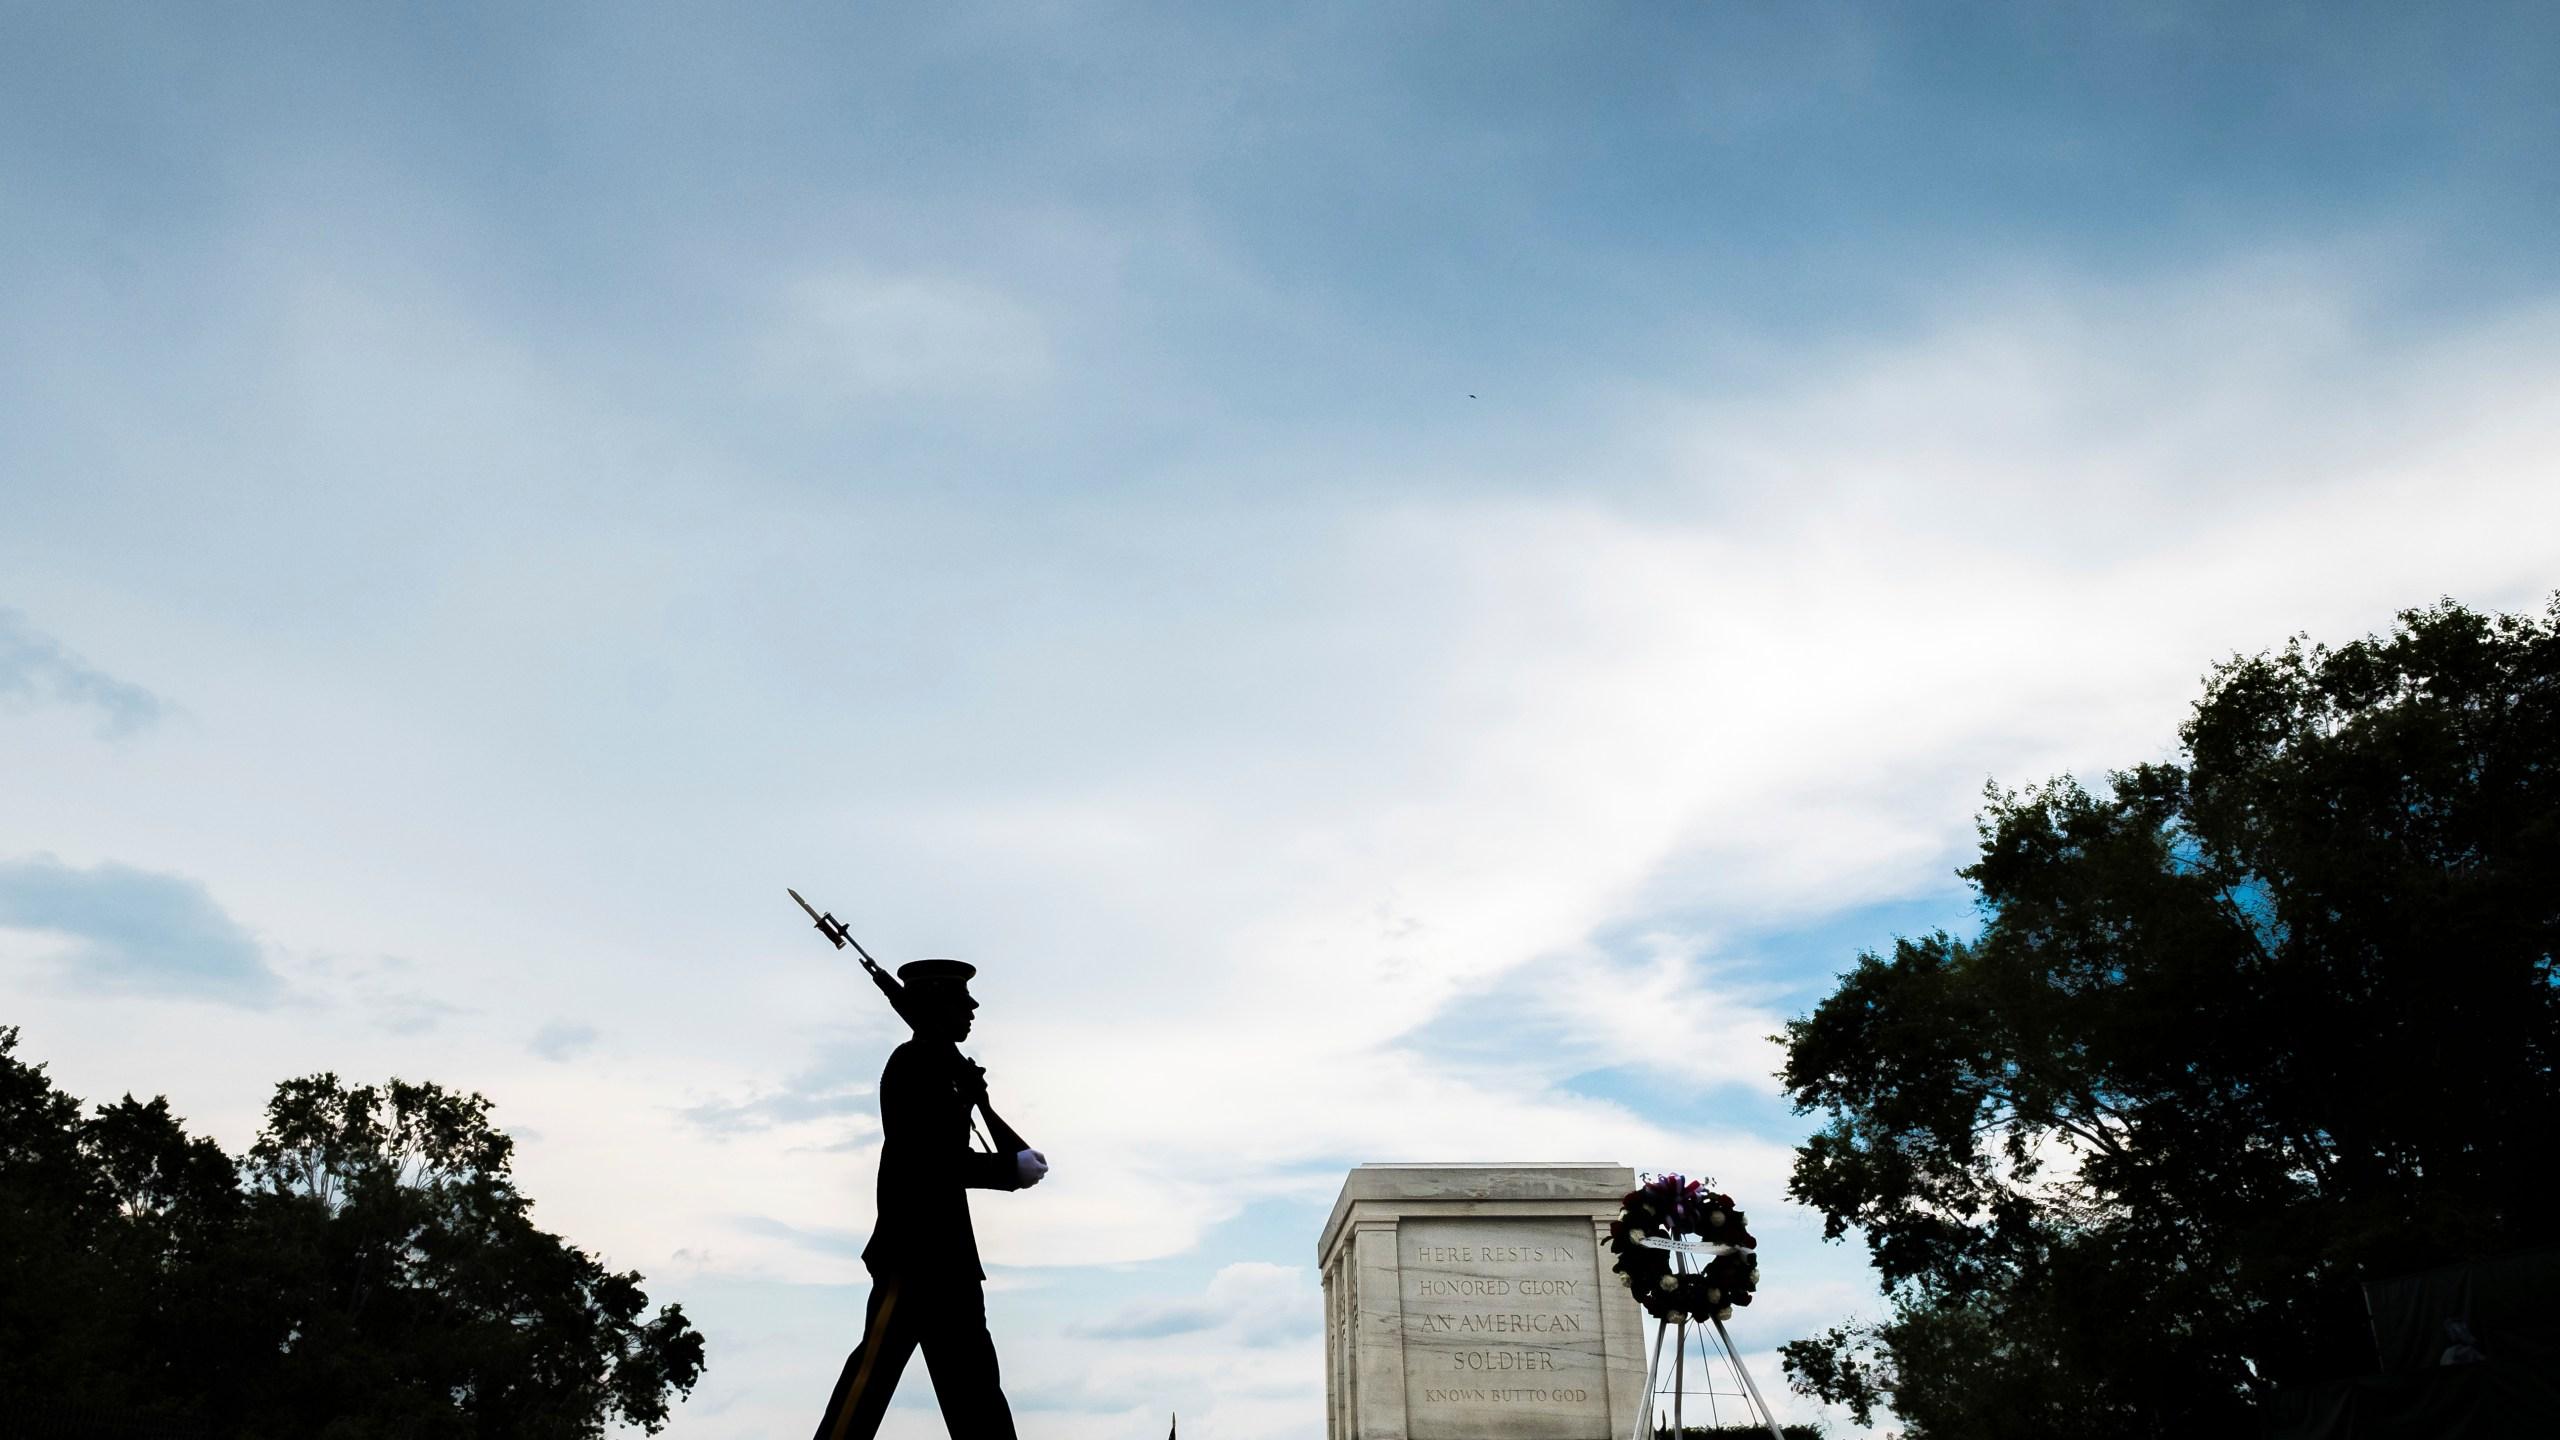 Washington_Memorial_Day_11286-159532.jpg98593365